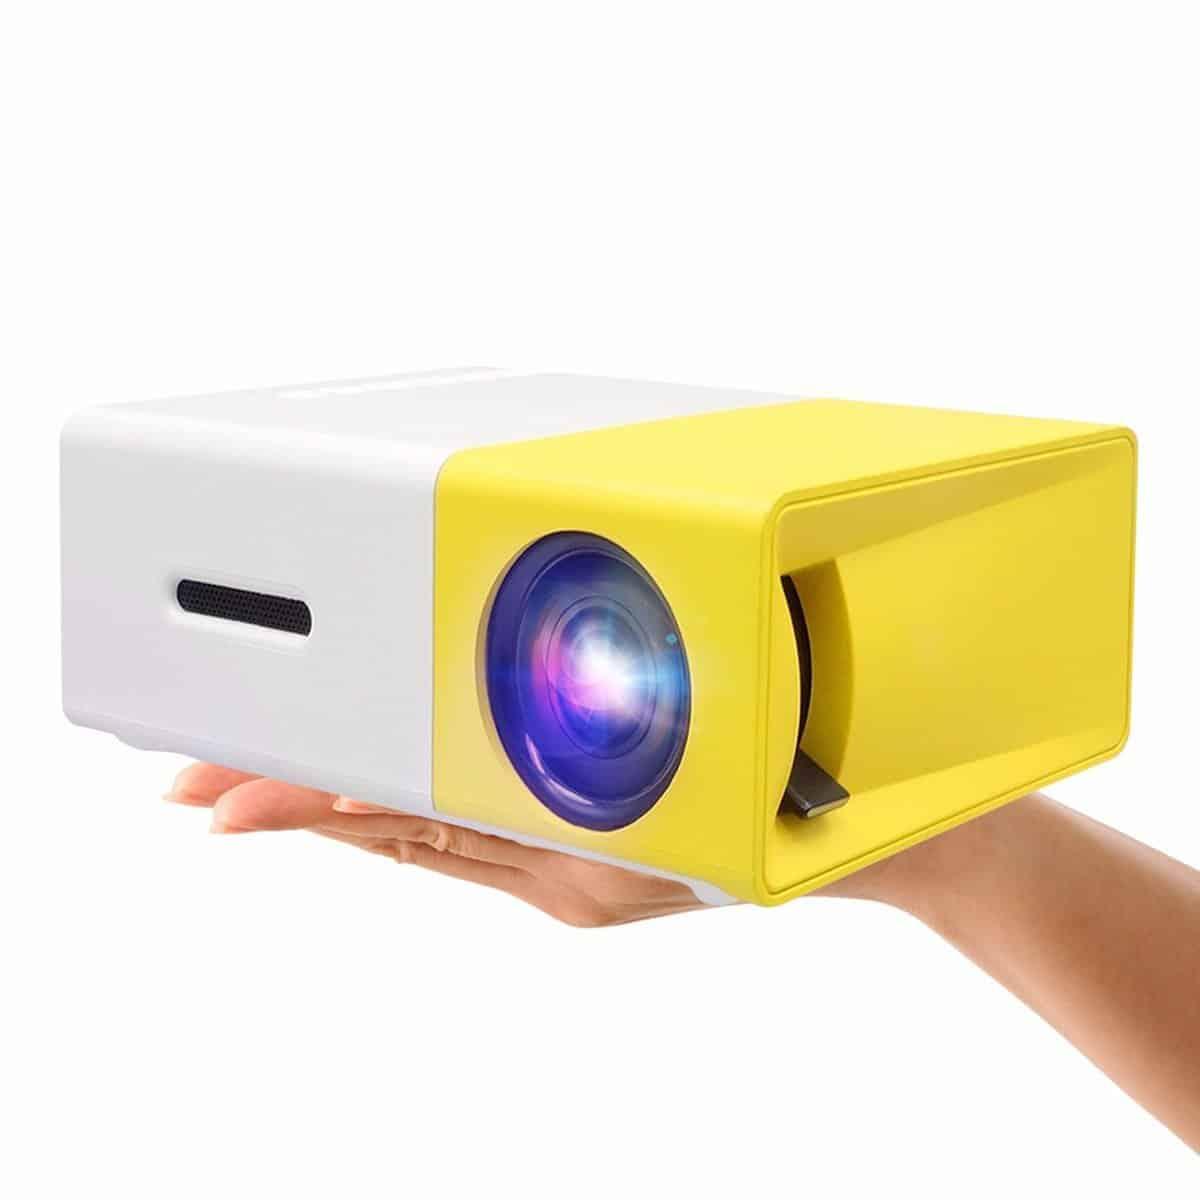 Elegiant Mini Projector - Best Mini Projector of 2017